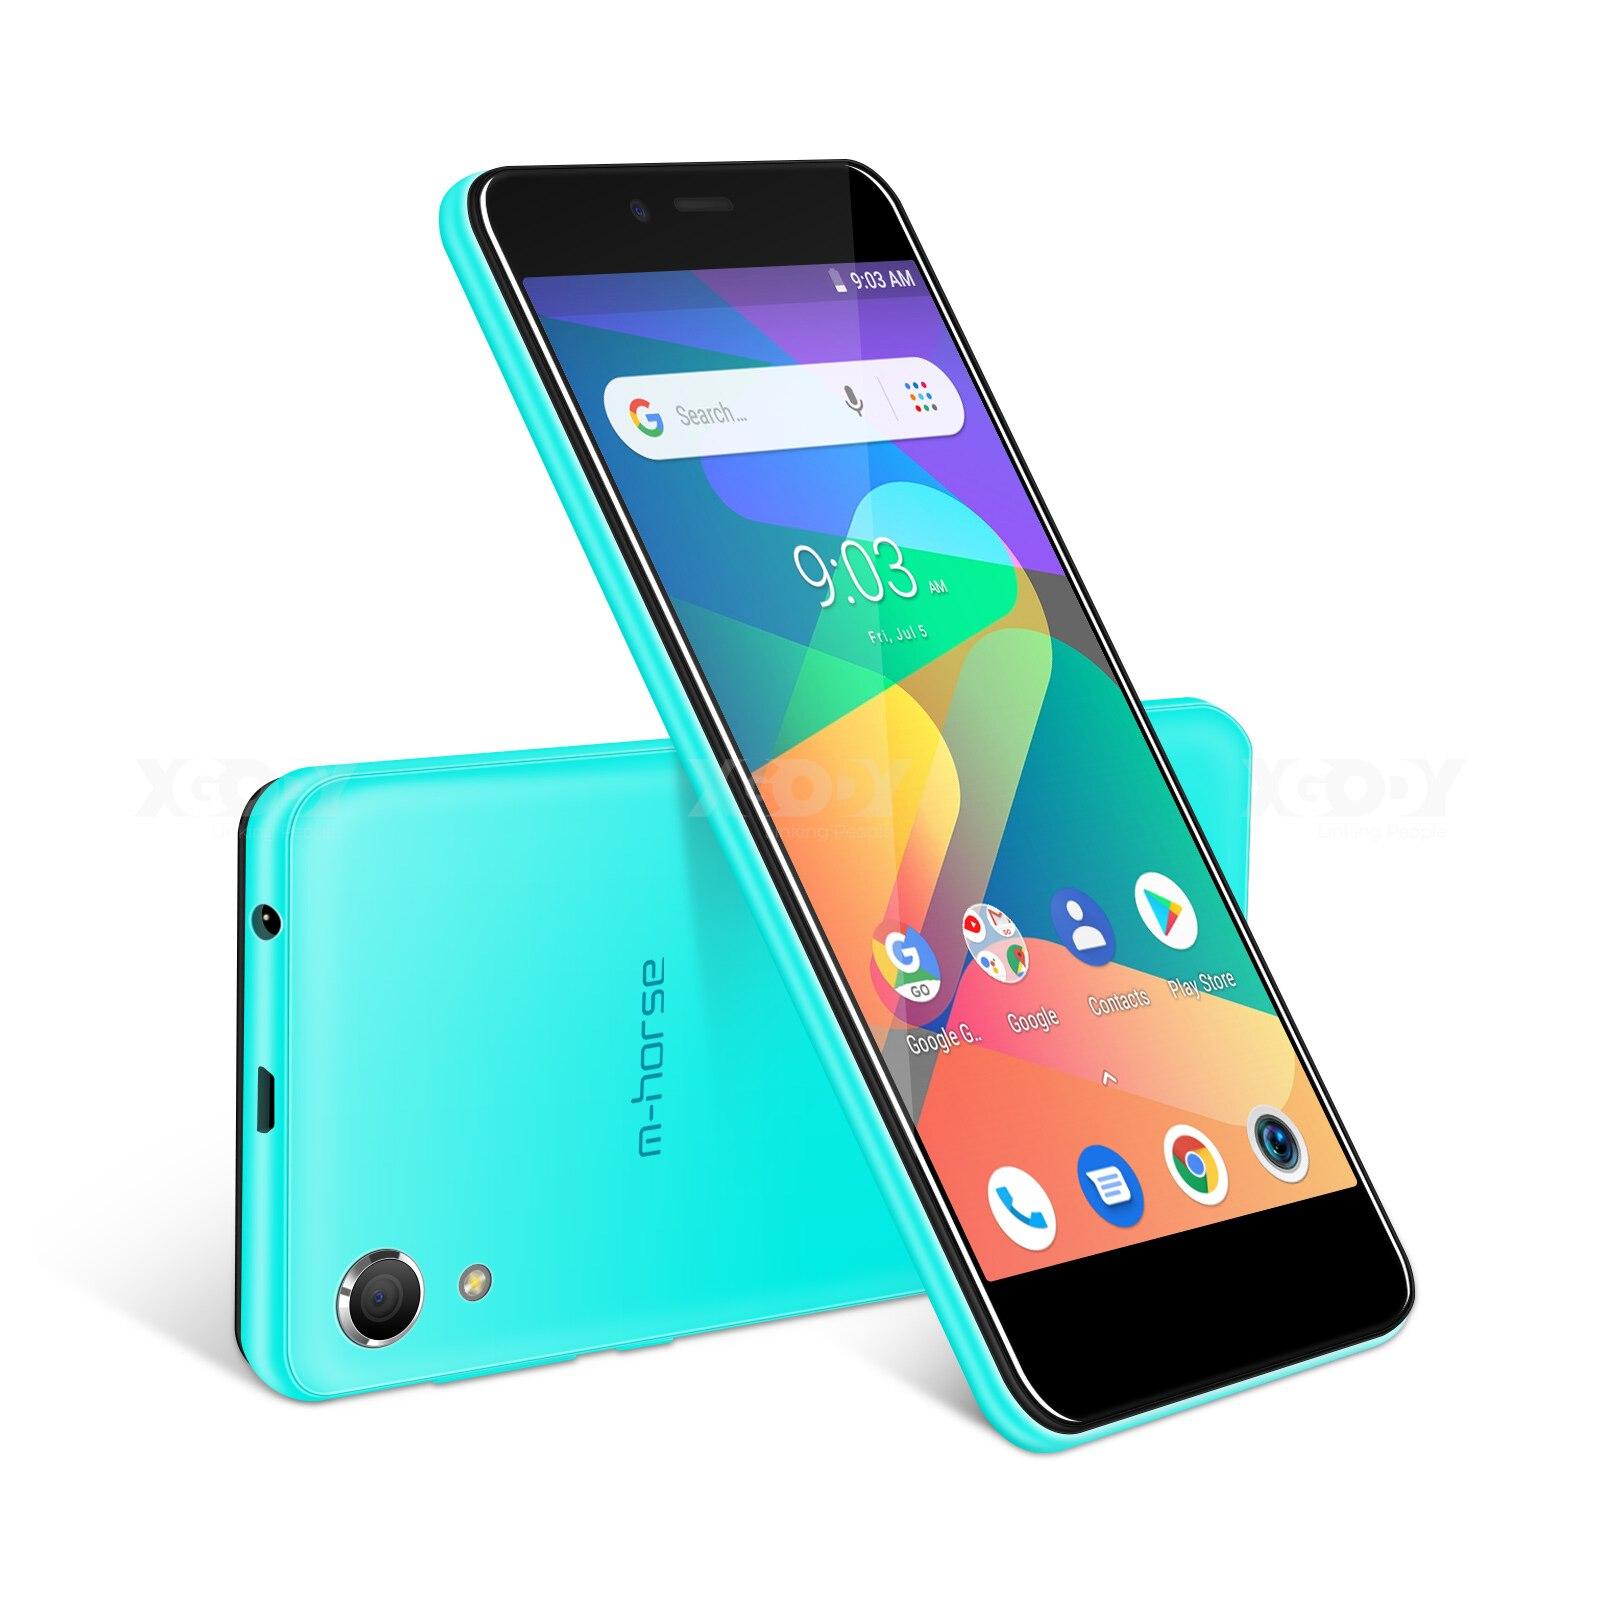 M HORSE Mobile Phone MTK6580 Quad Core Android 8.1 1GB RAM 8GB ROM 3G WCDMA 8.0MP 2000mAh Dual SIM Smartphone 5 Inch Celular